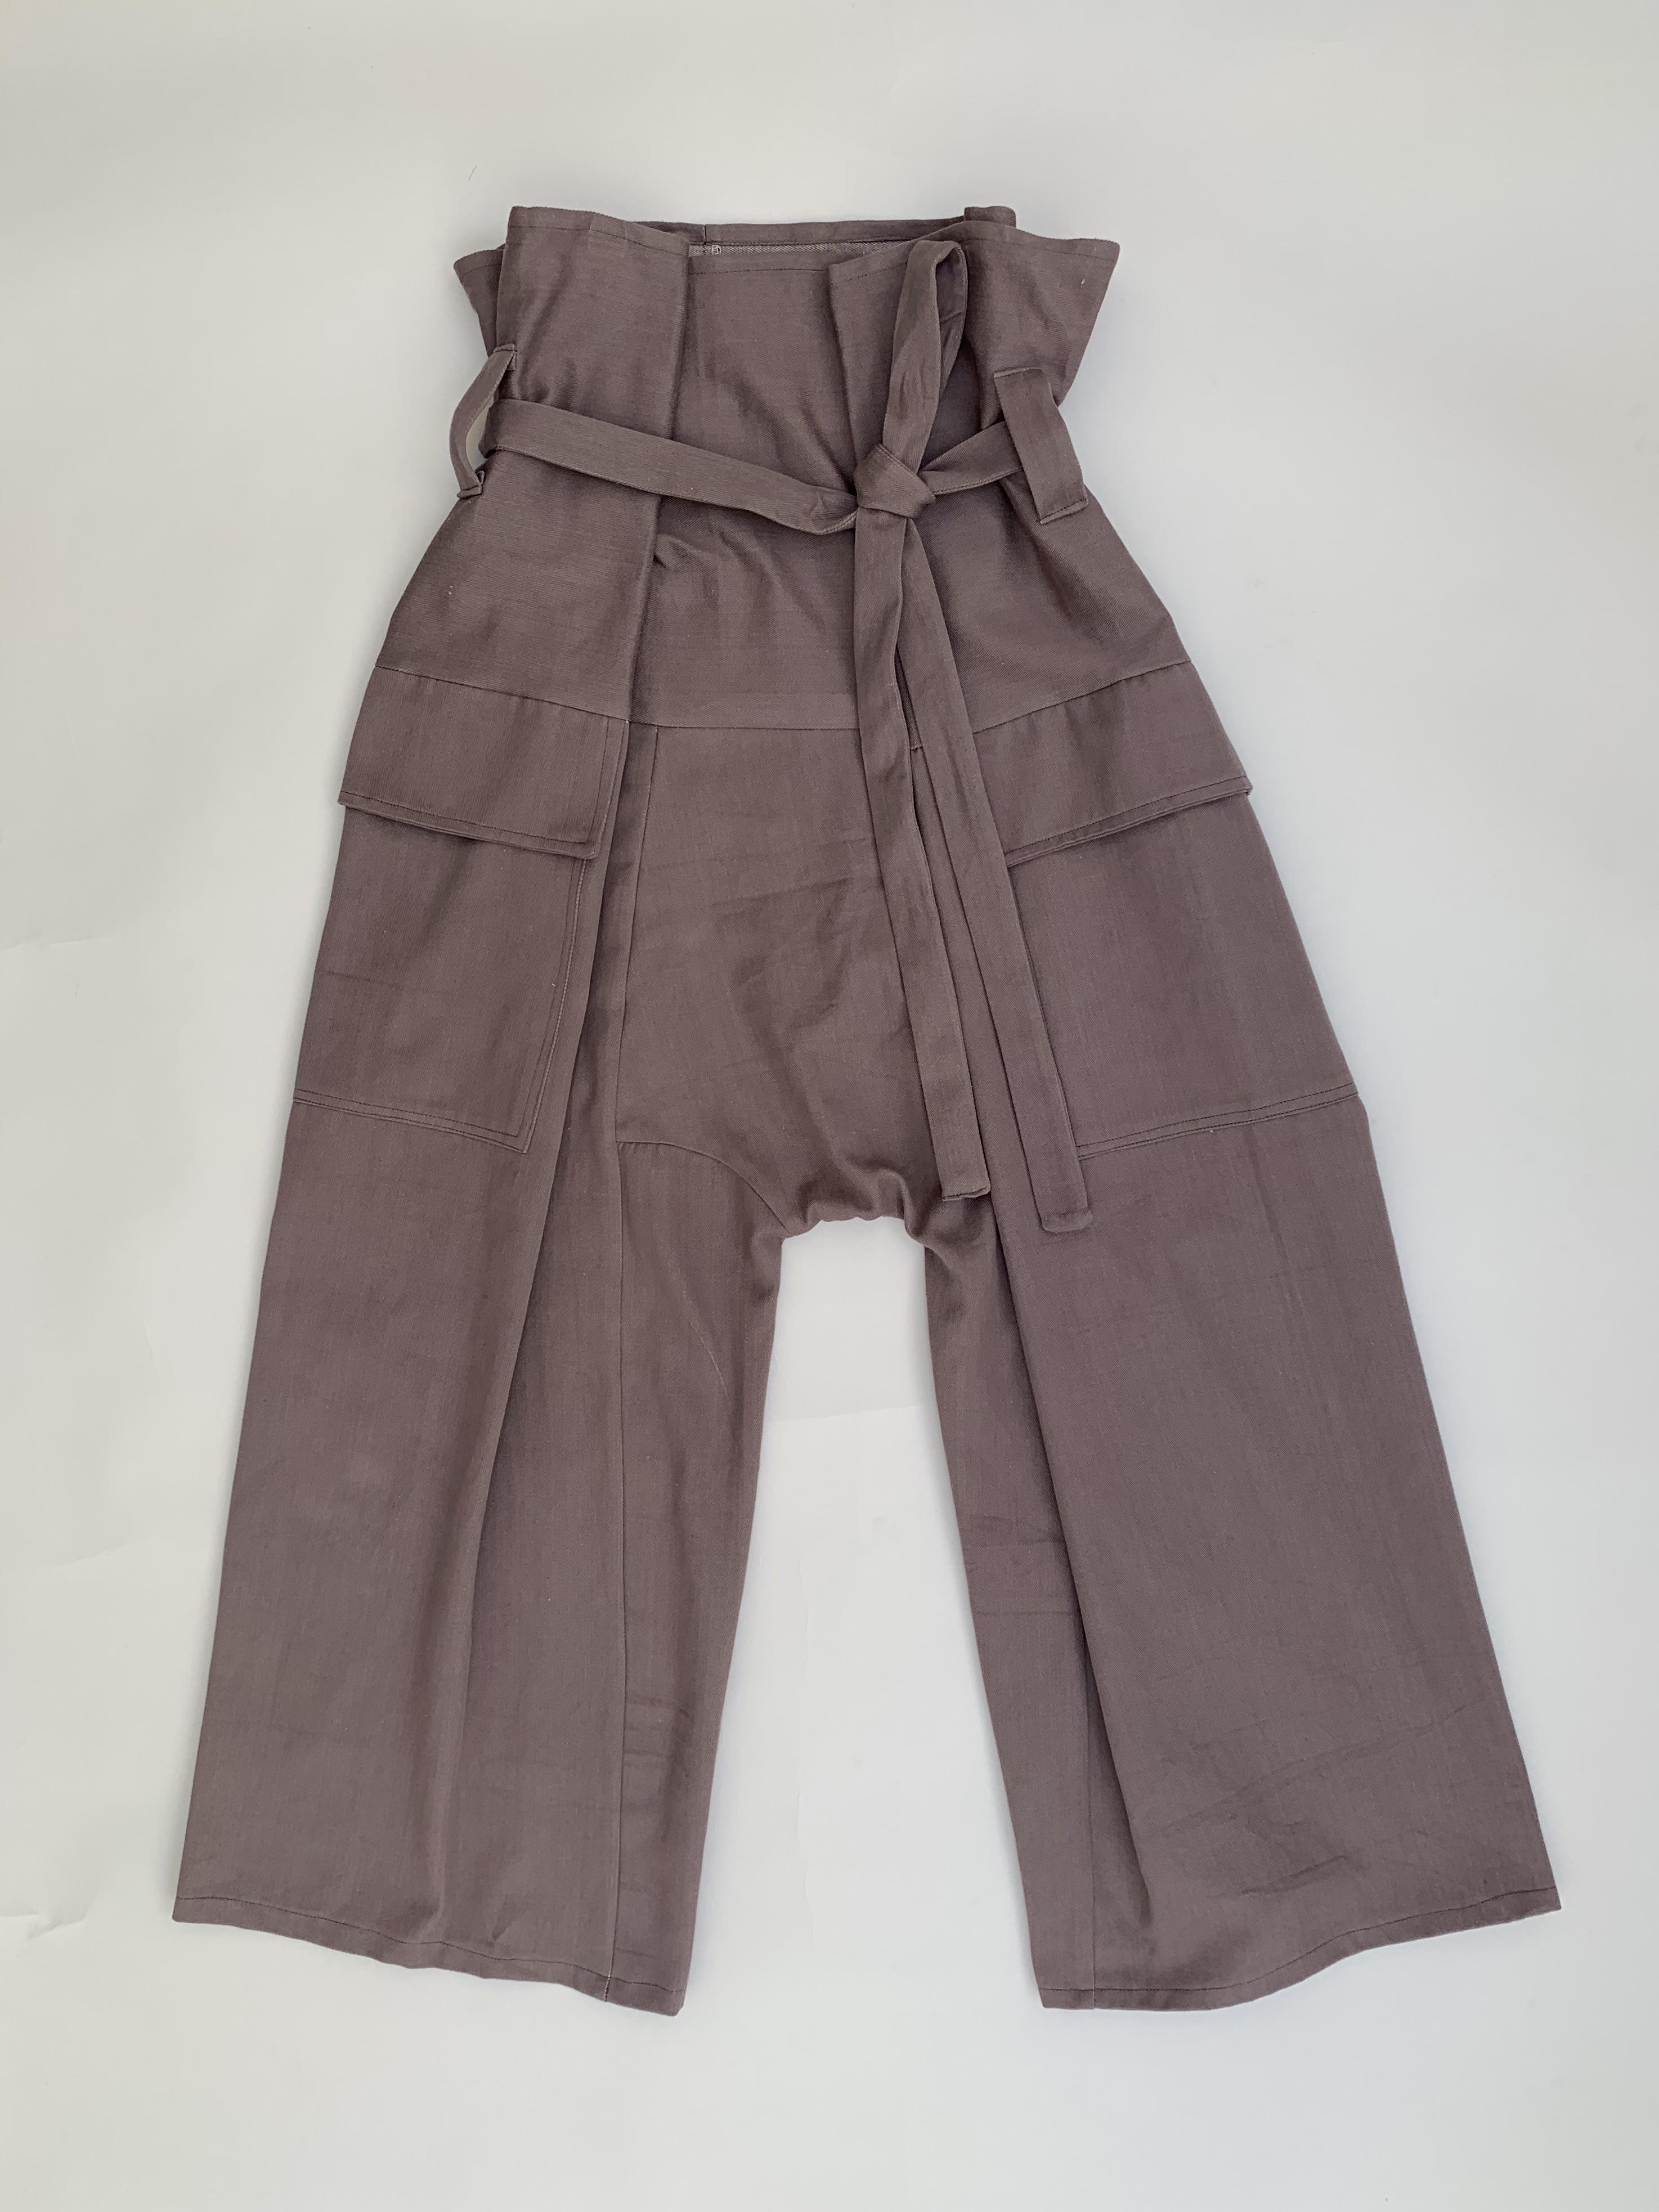 Cargo Fisherman's Pant